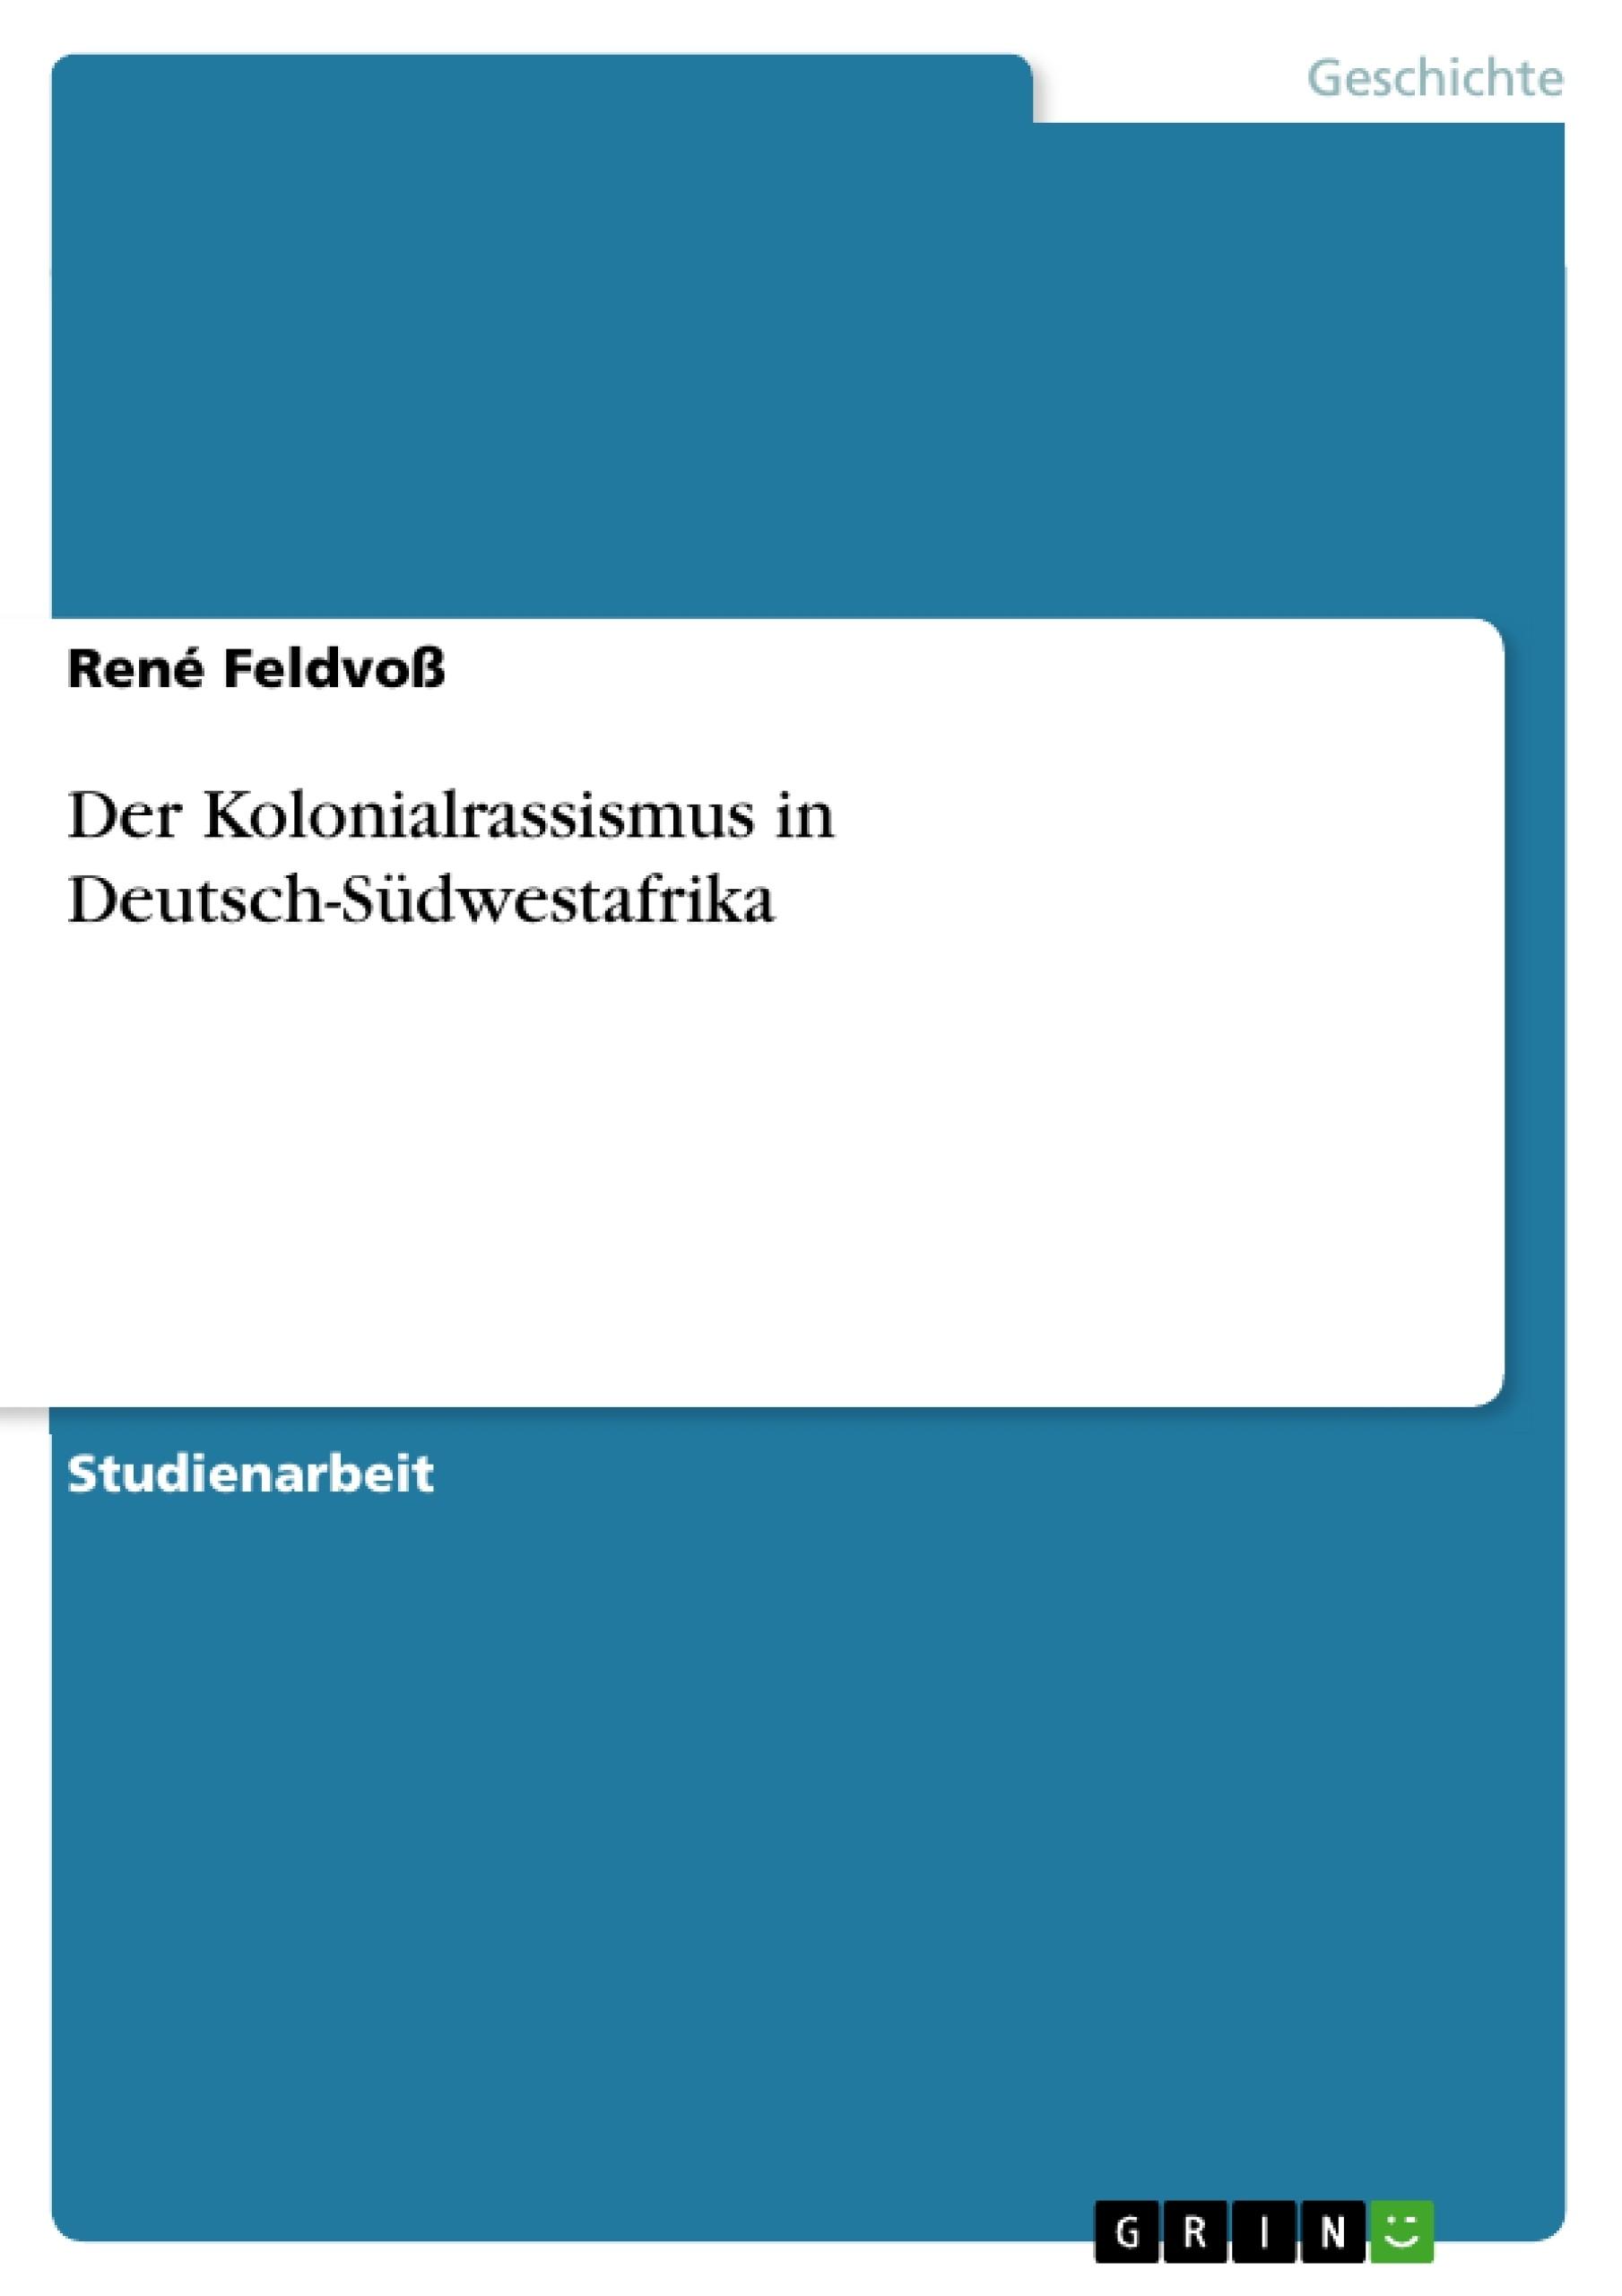 Titel: Der Kolonialrassismus in Deutsch-Südwestafrika